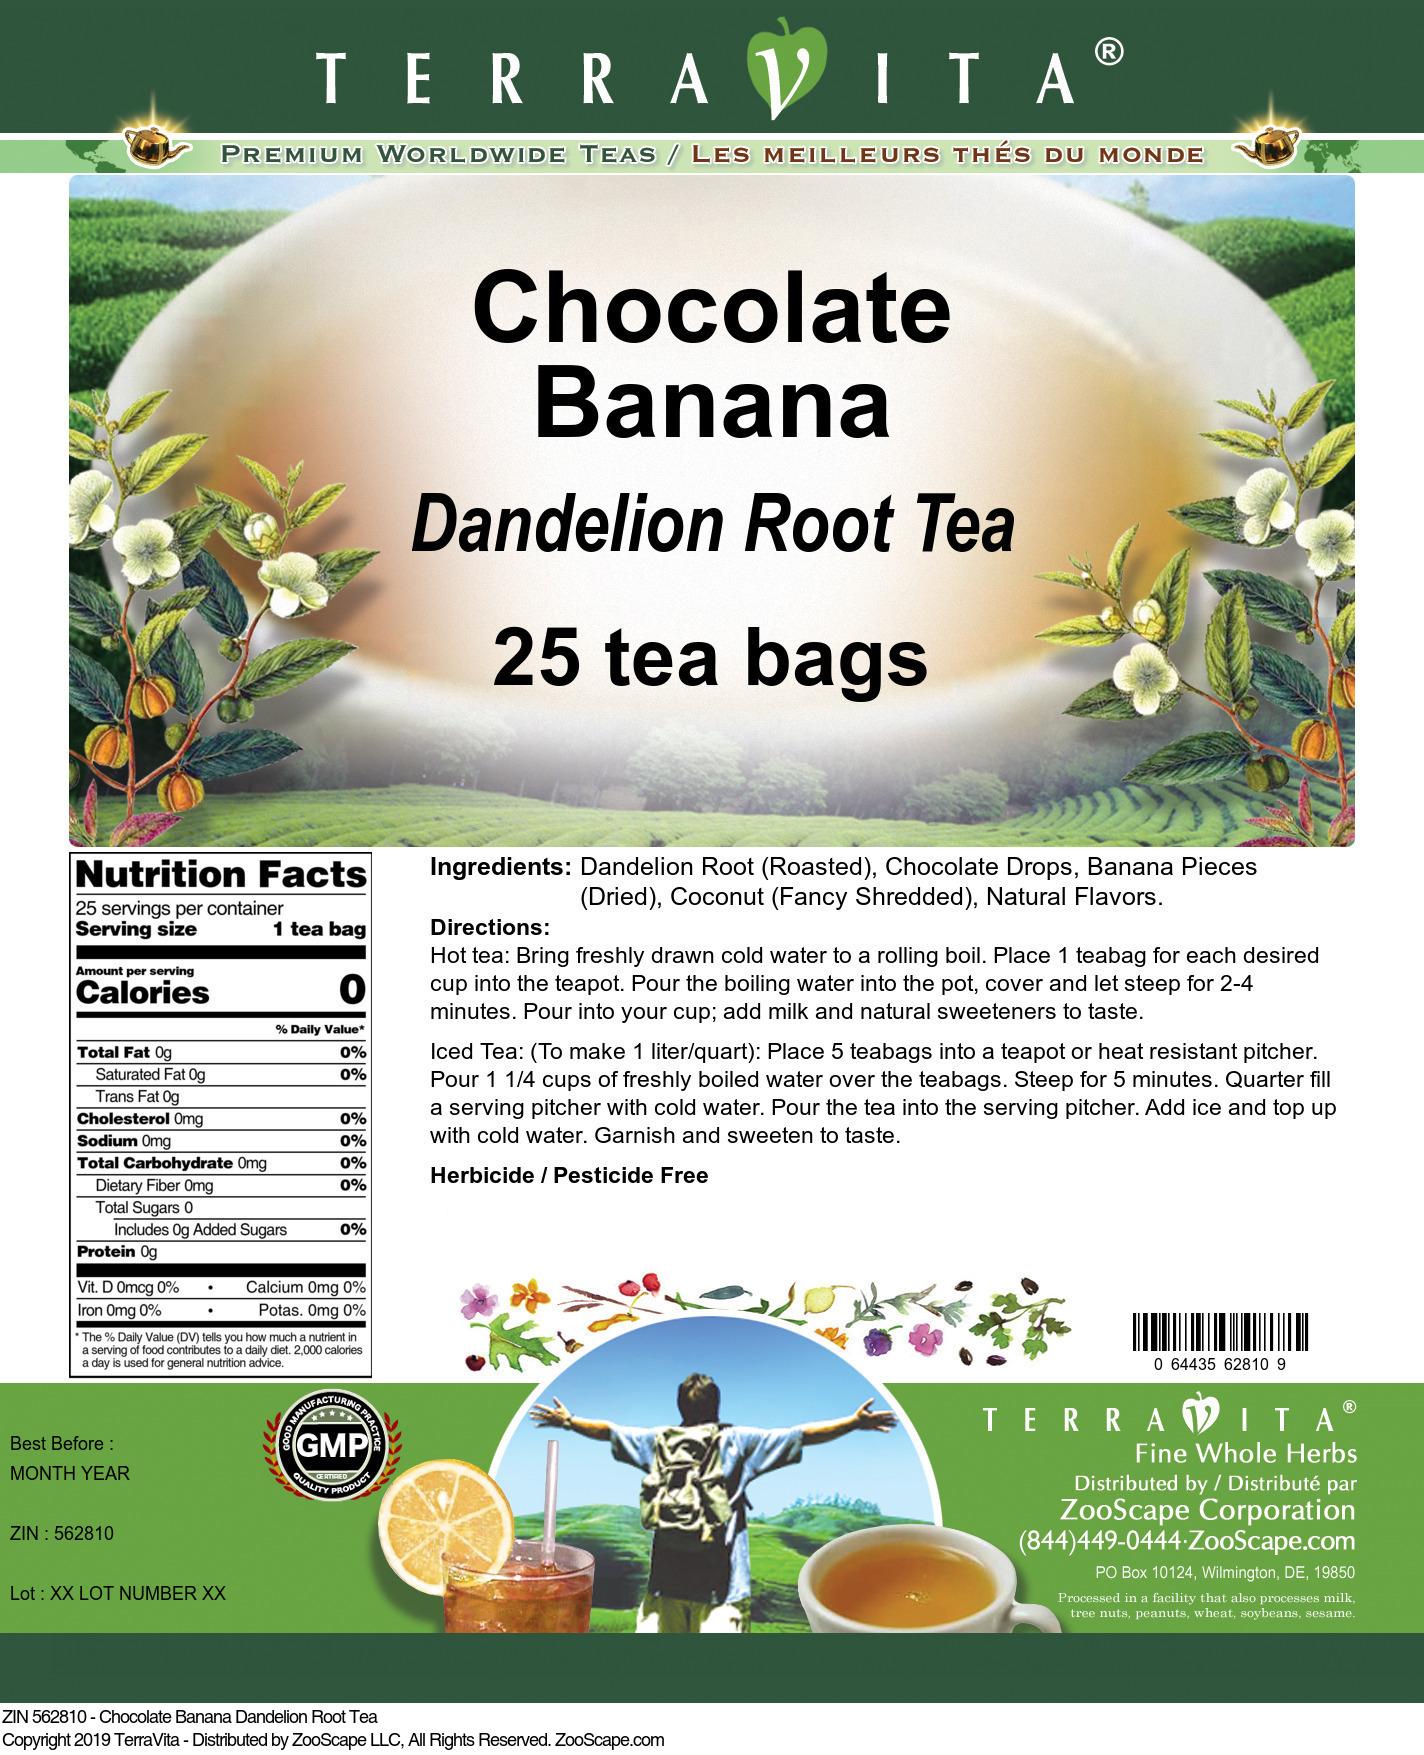 Chocolate Banana Dandelion Root Tea